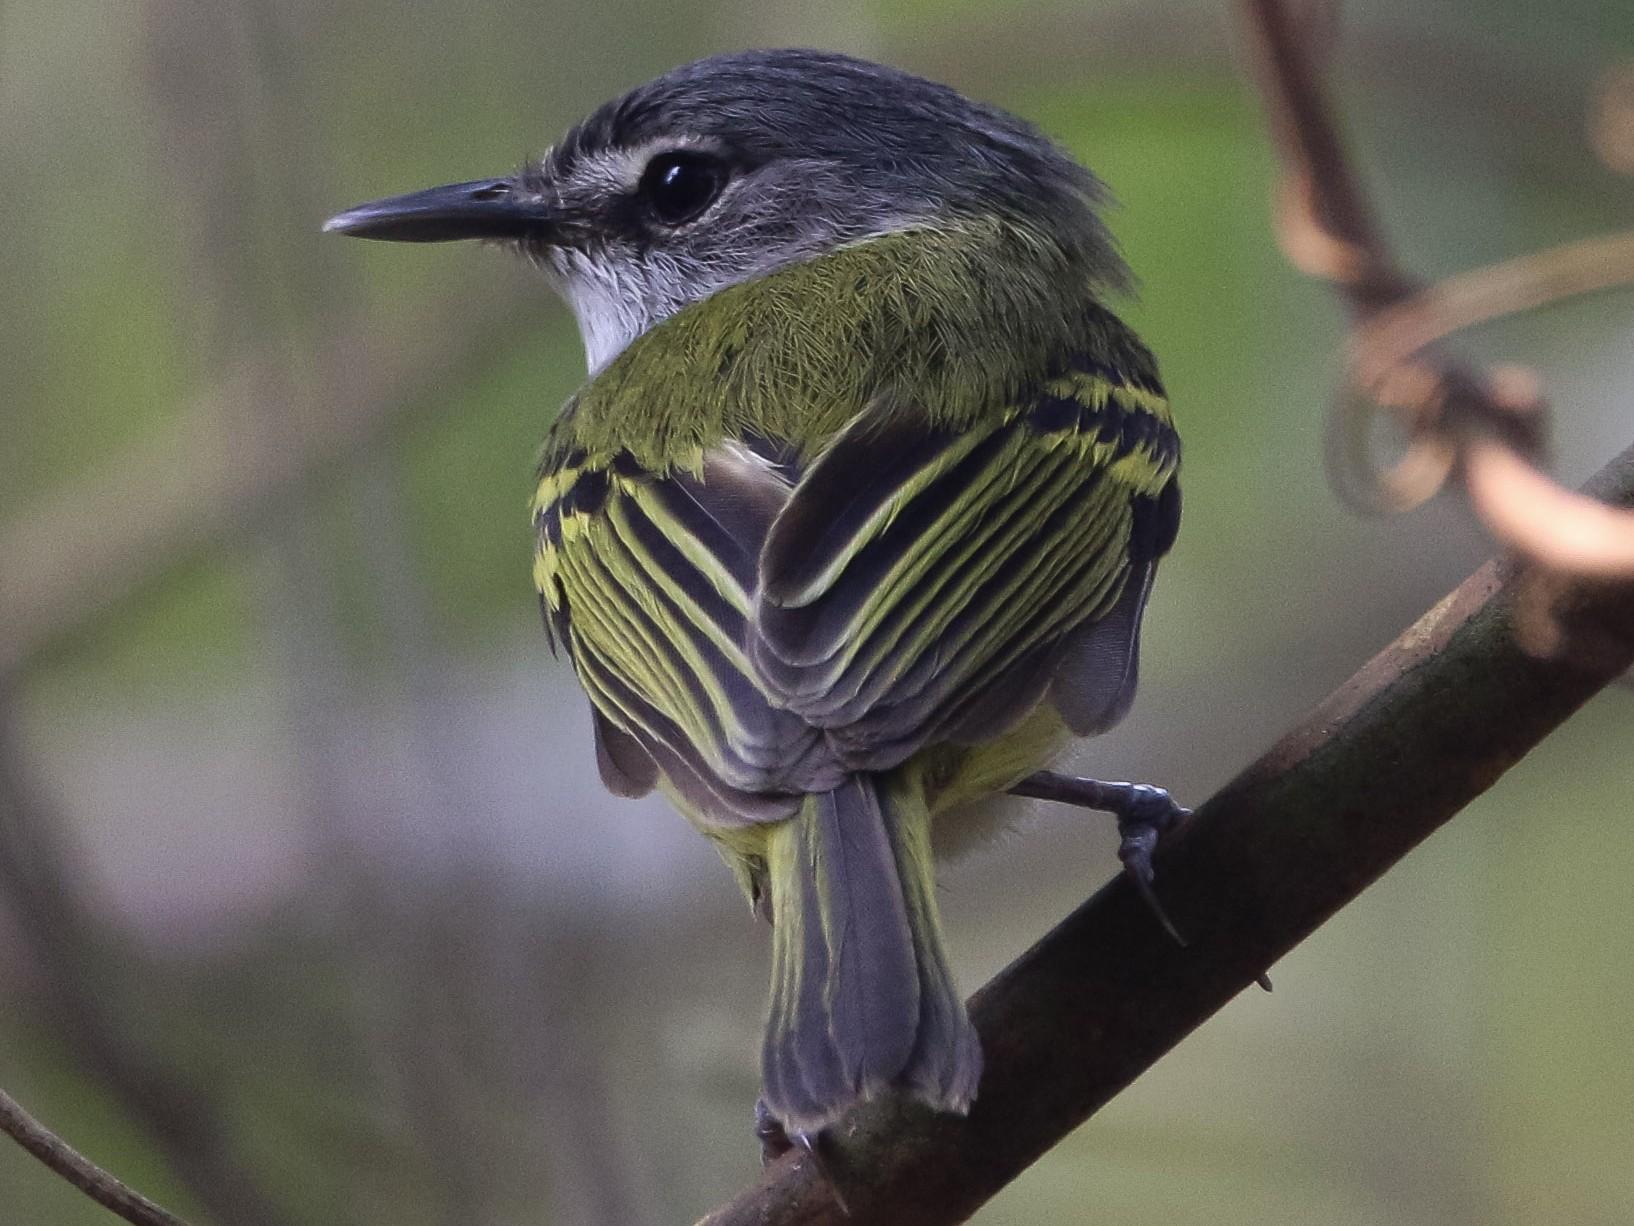 Slate-headed Tody-Flycatcher - Isaias morataya